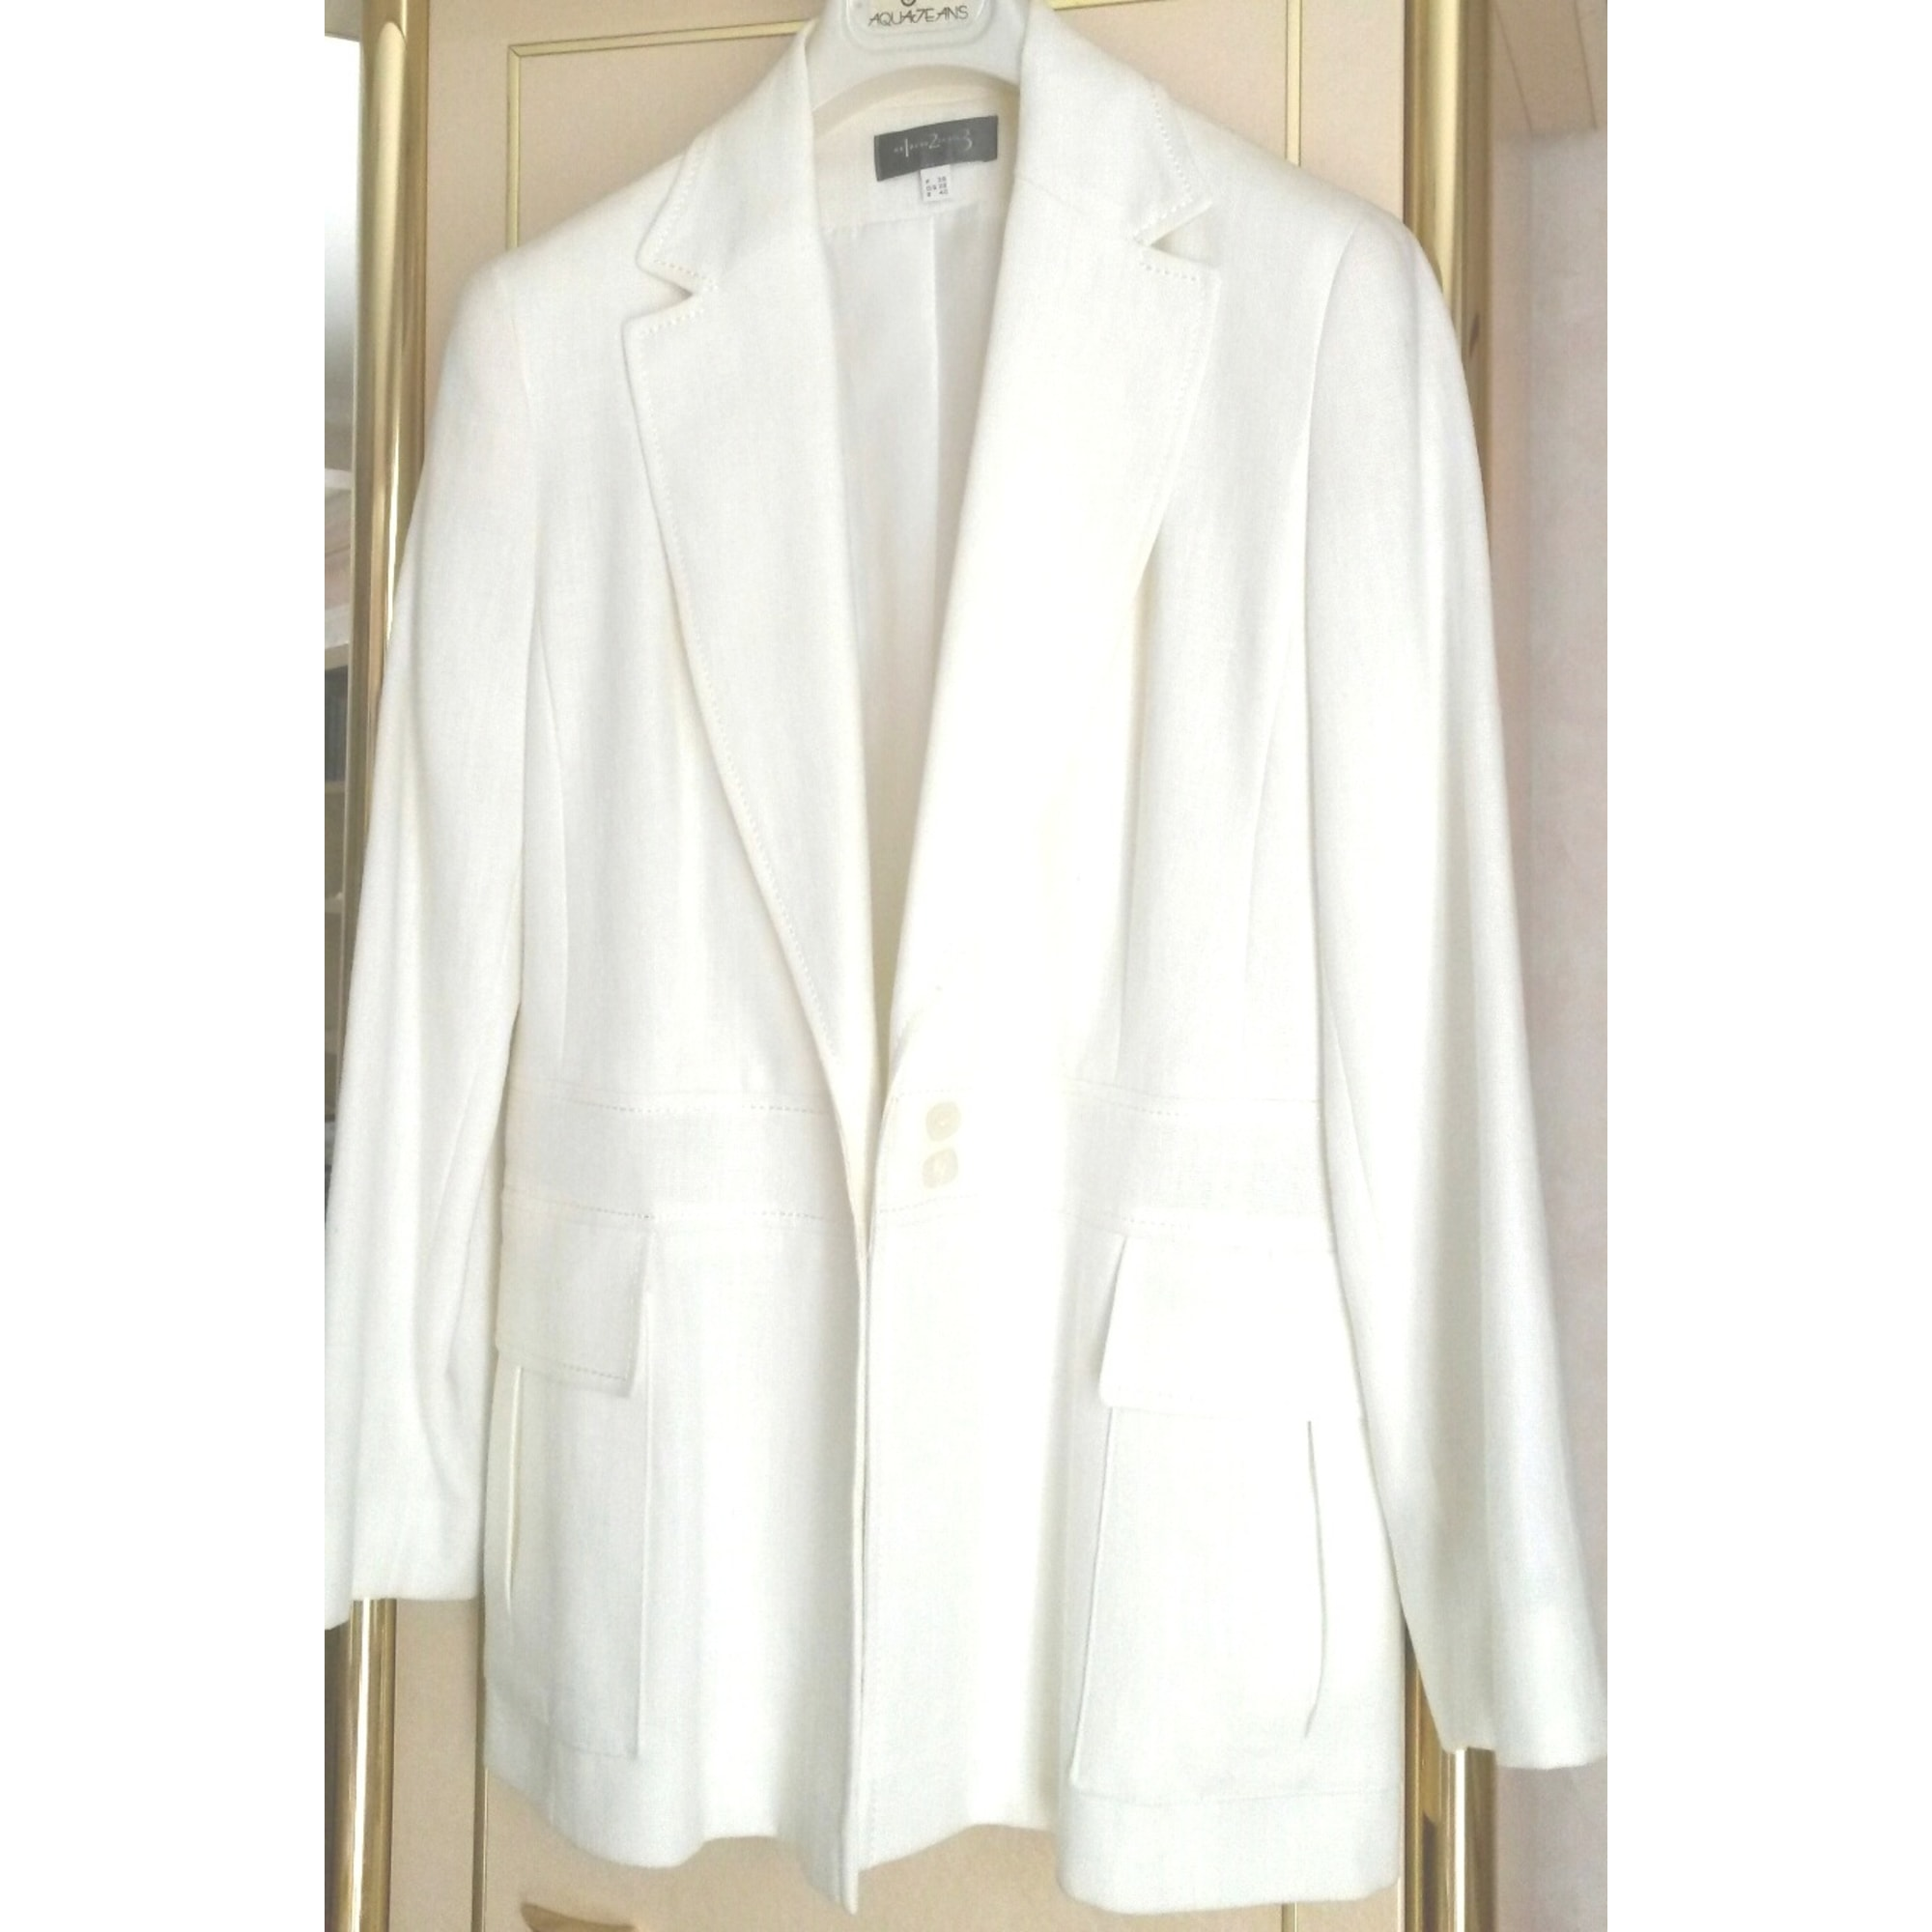 : Ecru Blazers Tailleurs : Vêtements